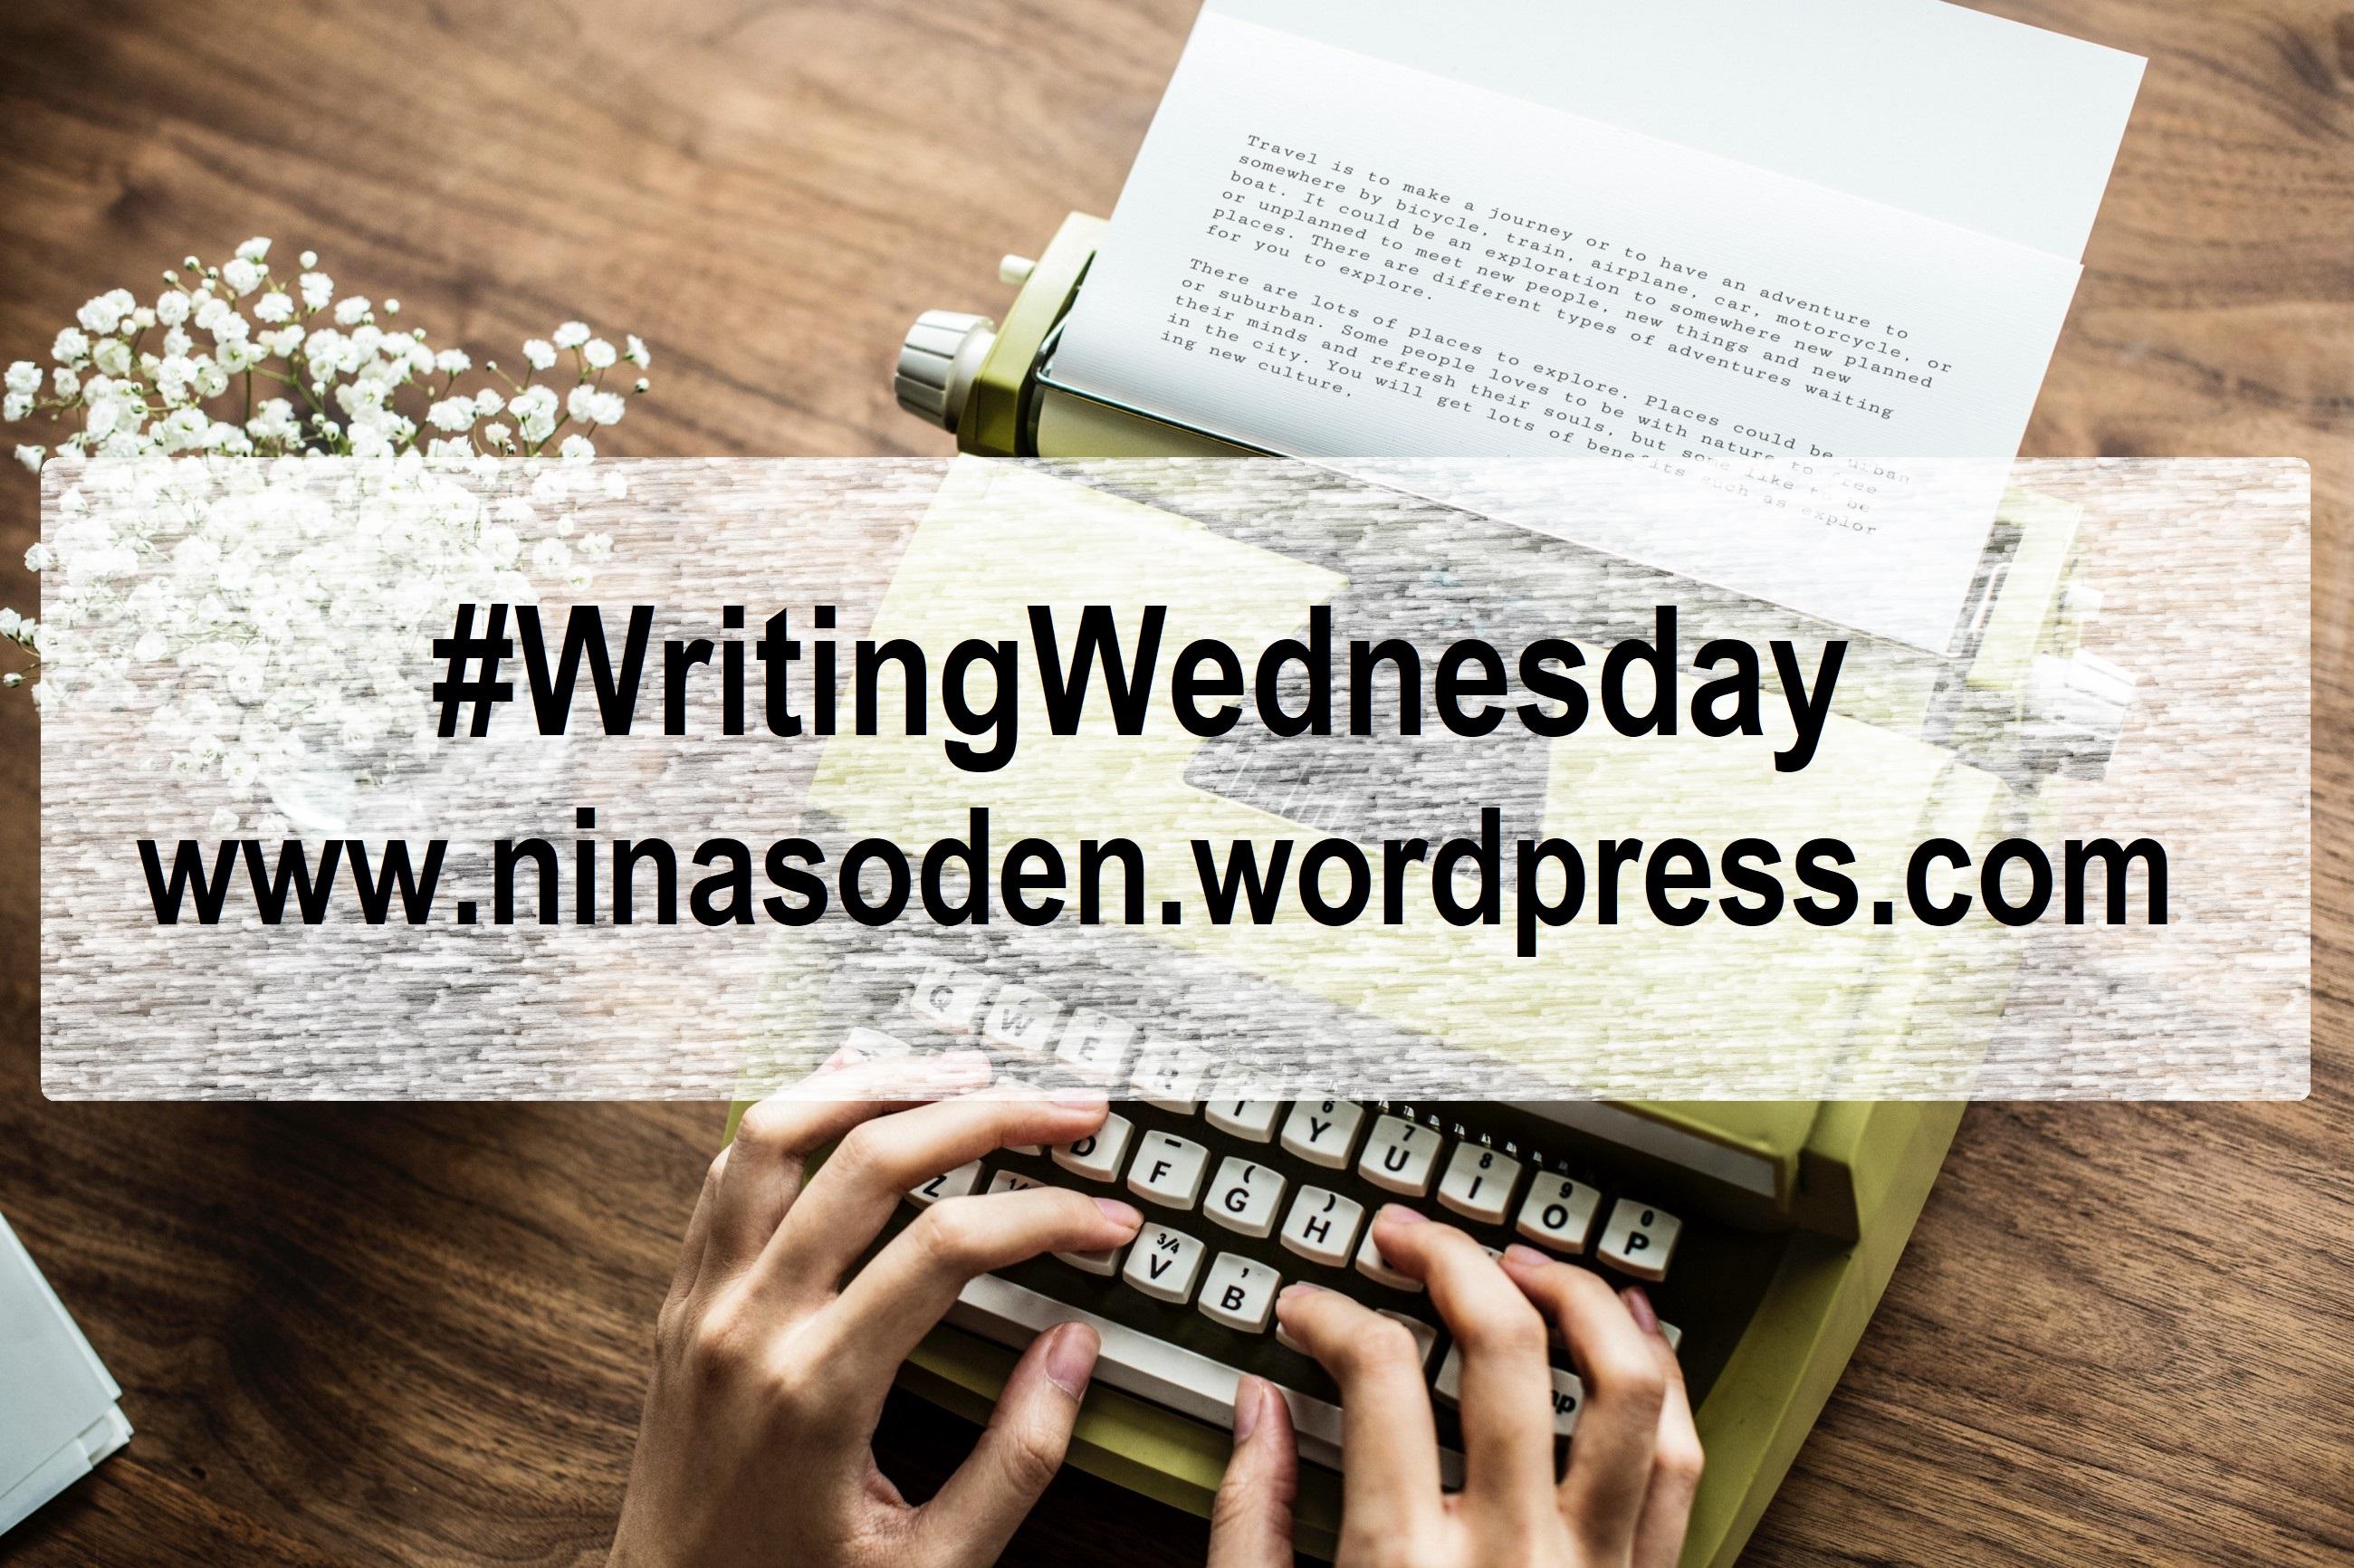 Writing Wednesday 4